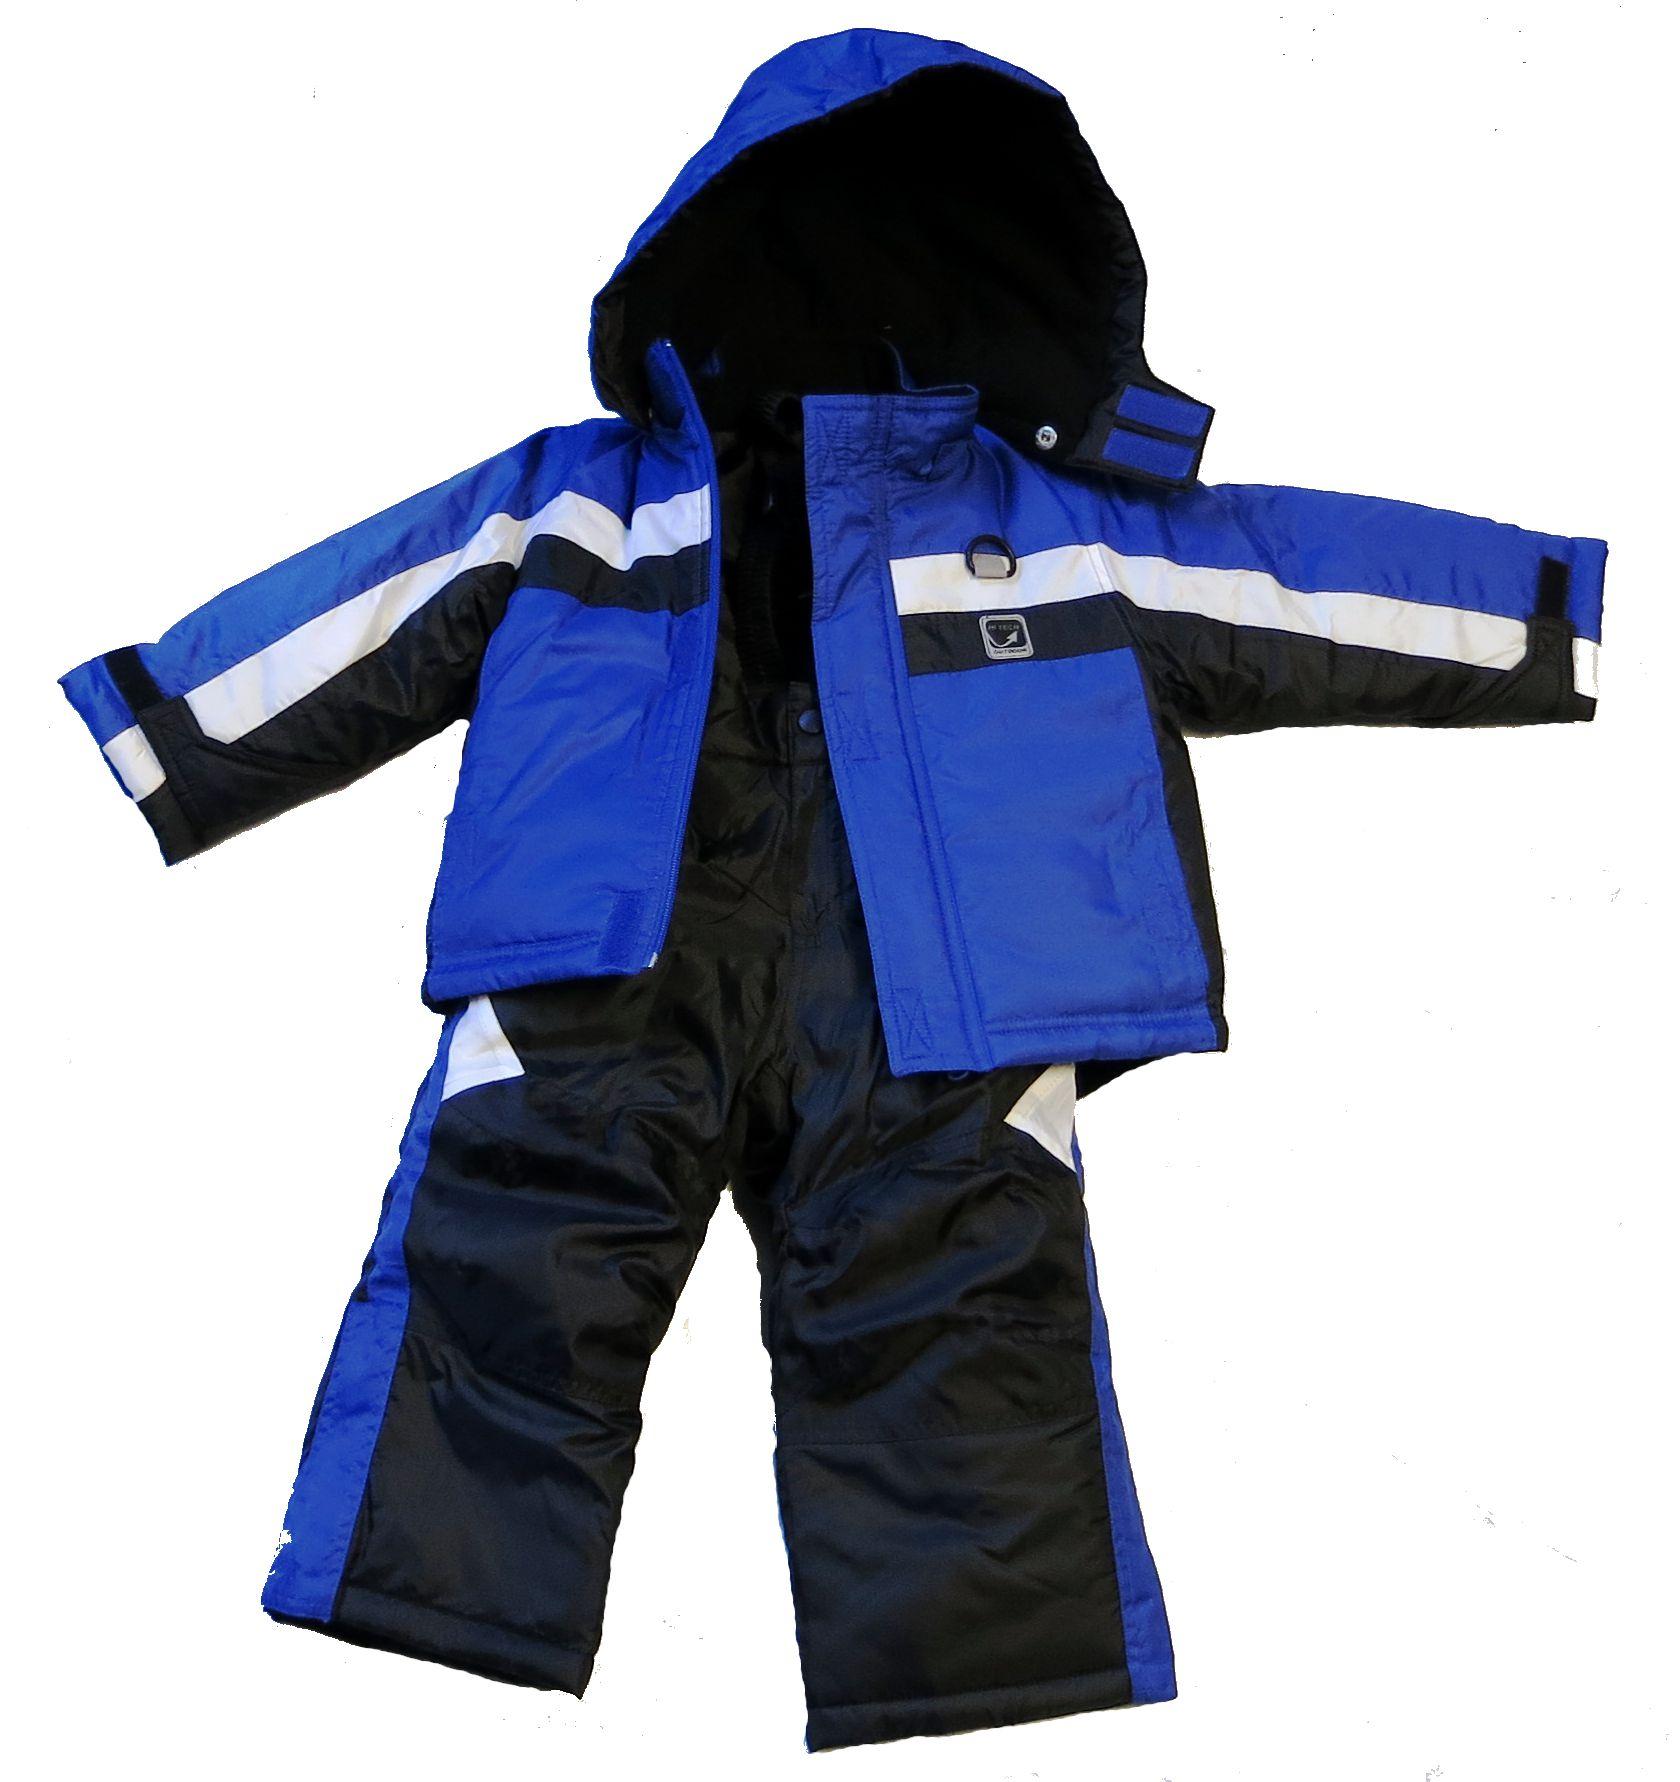 KINDER-Jungen-Maedchen-SKIANZUG-Schneeanzug-HIGHTECH-fashion-NEU